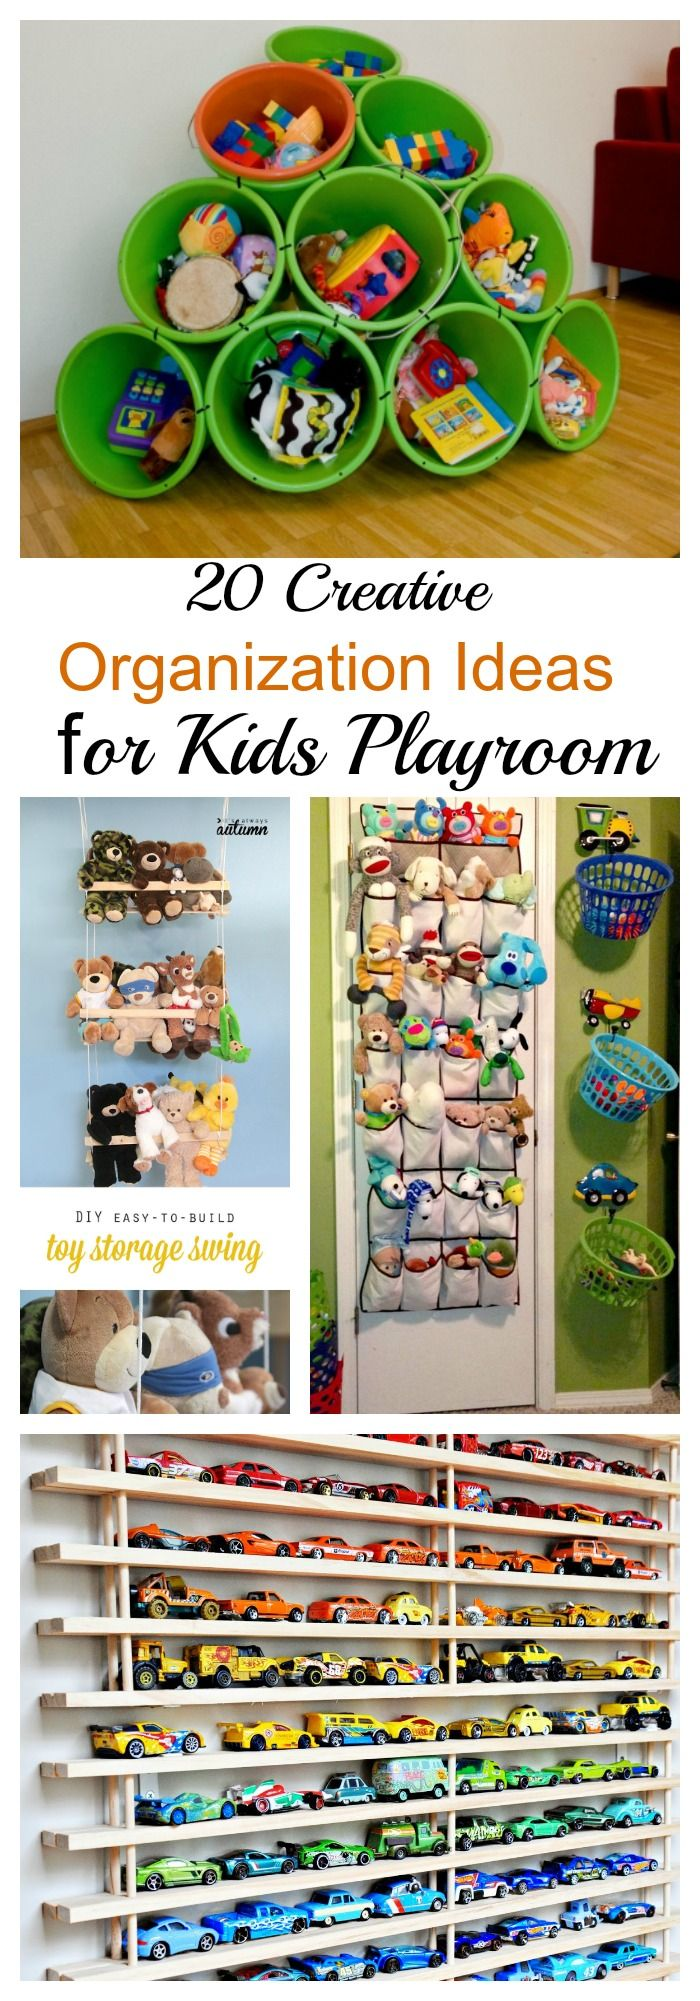 20 Creative Organization Ideas for Kids Playroom